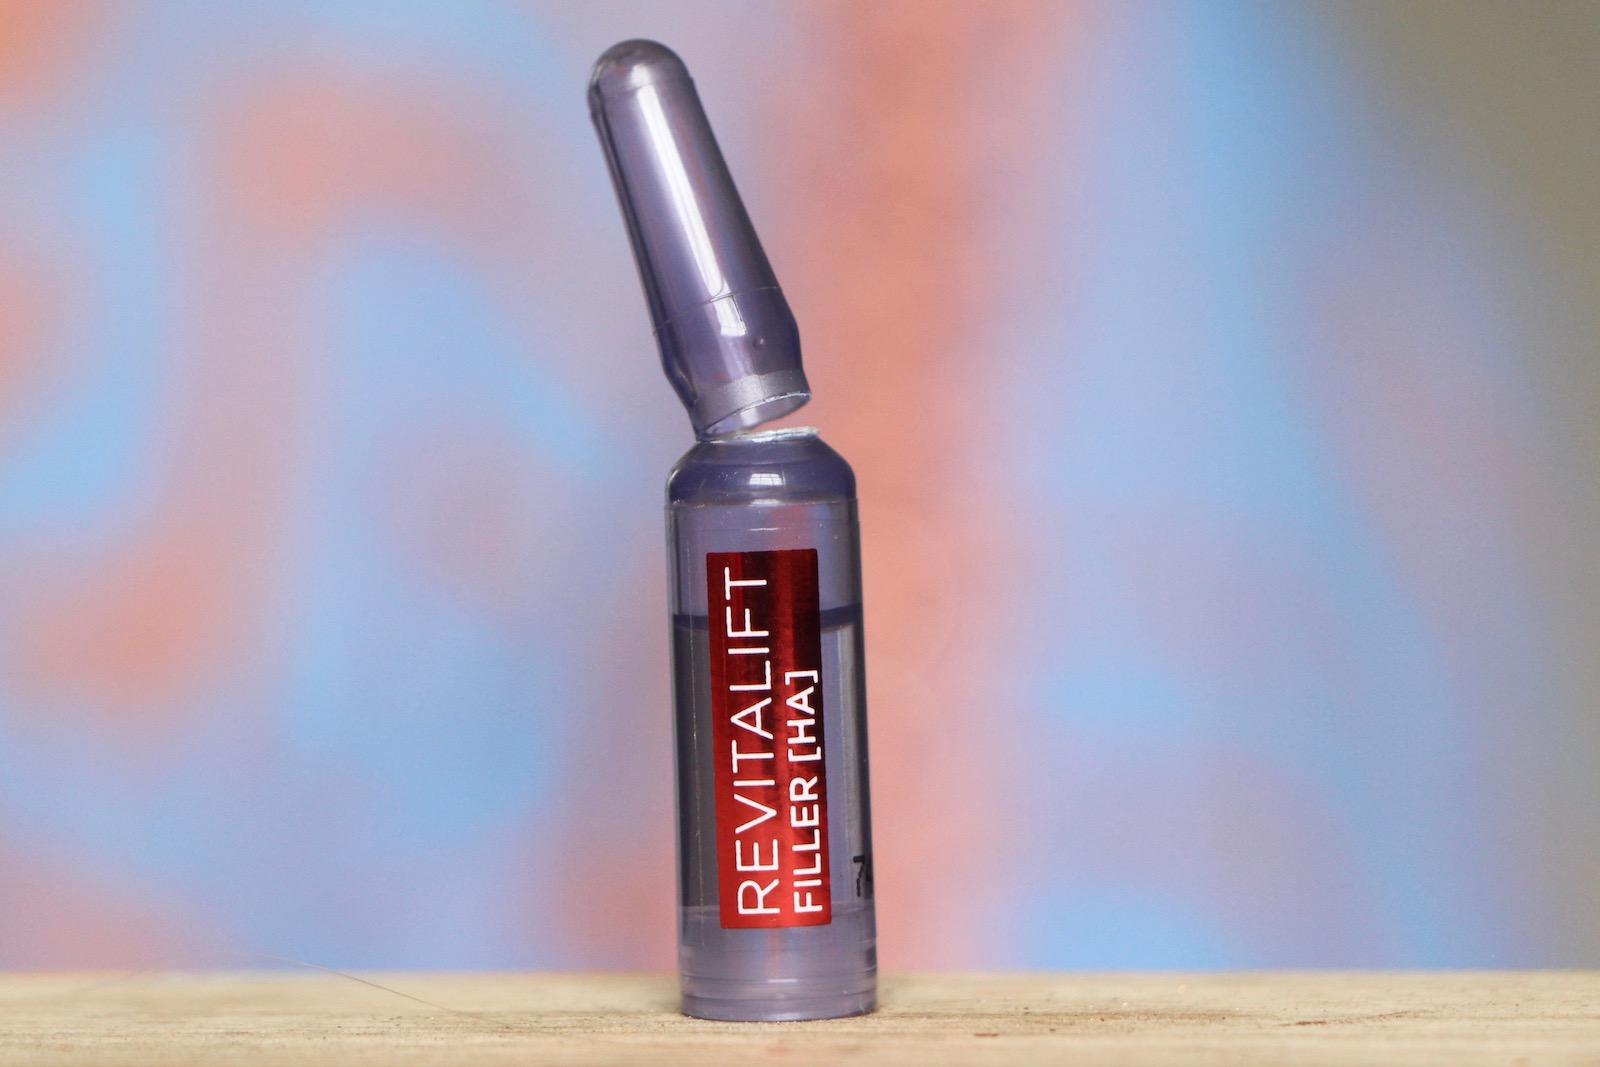 L'Oreal Revitalift Ampoules Review